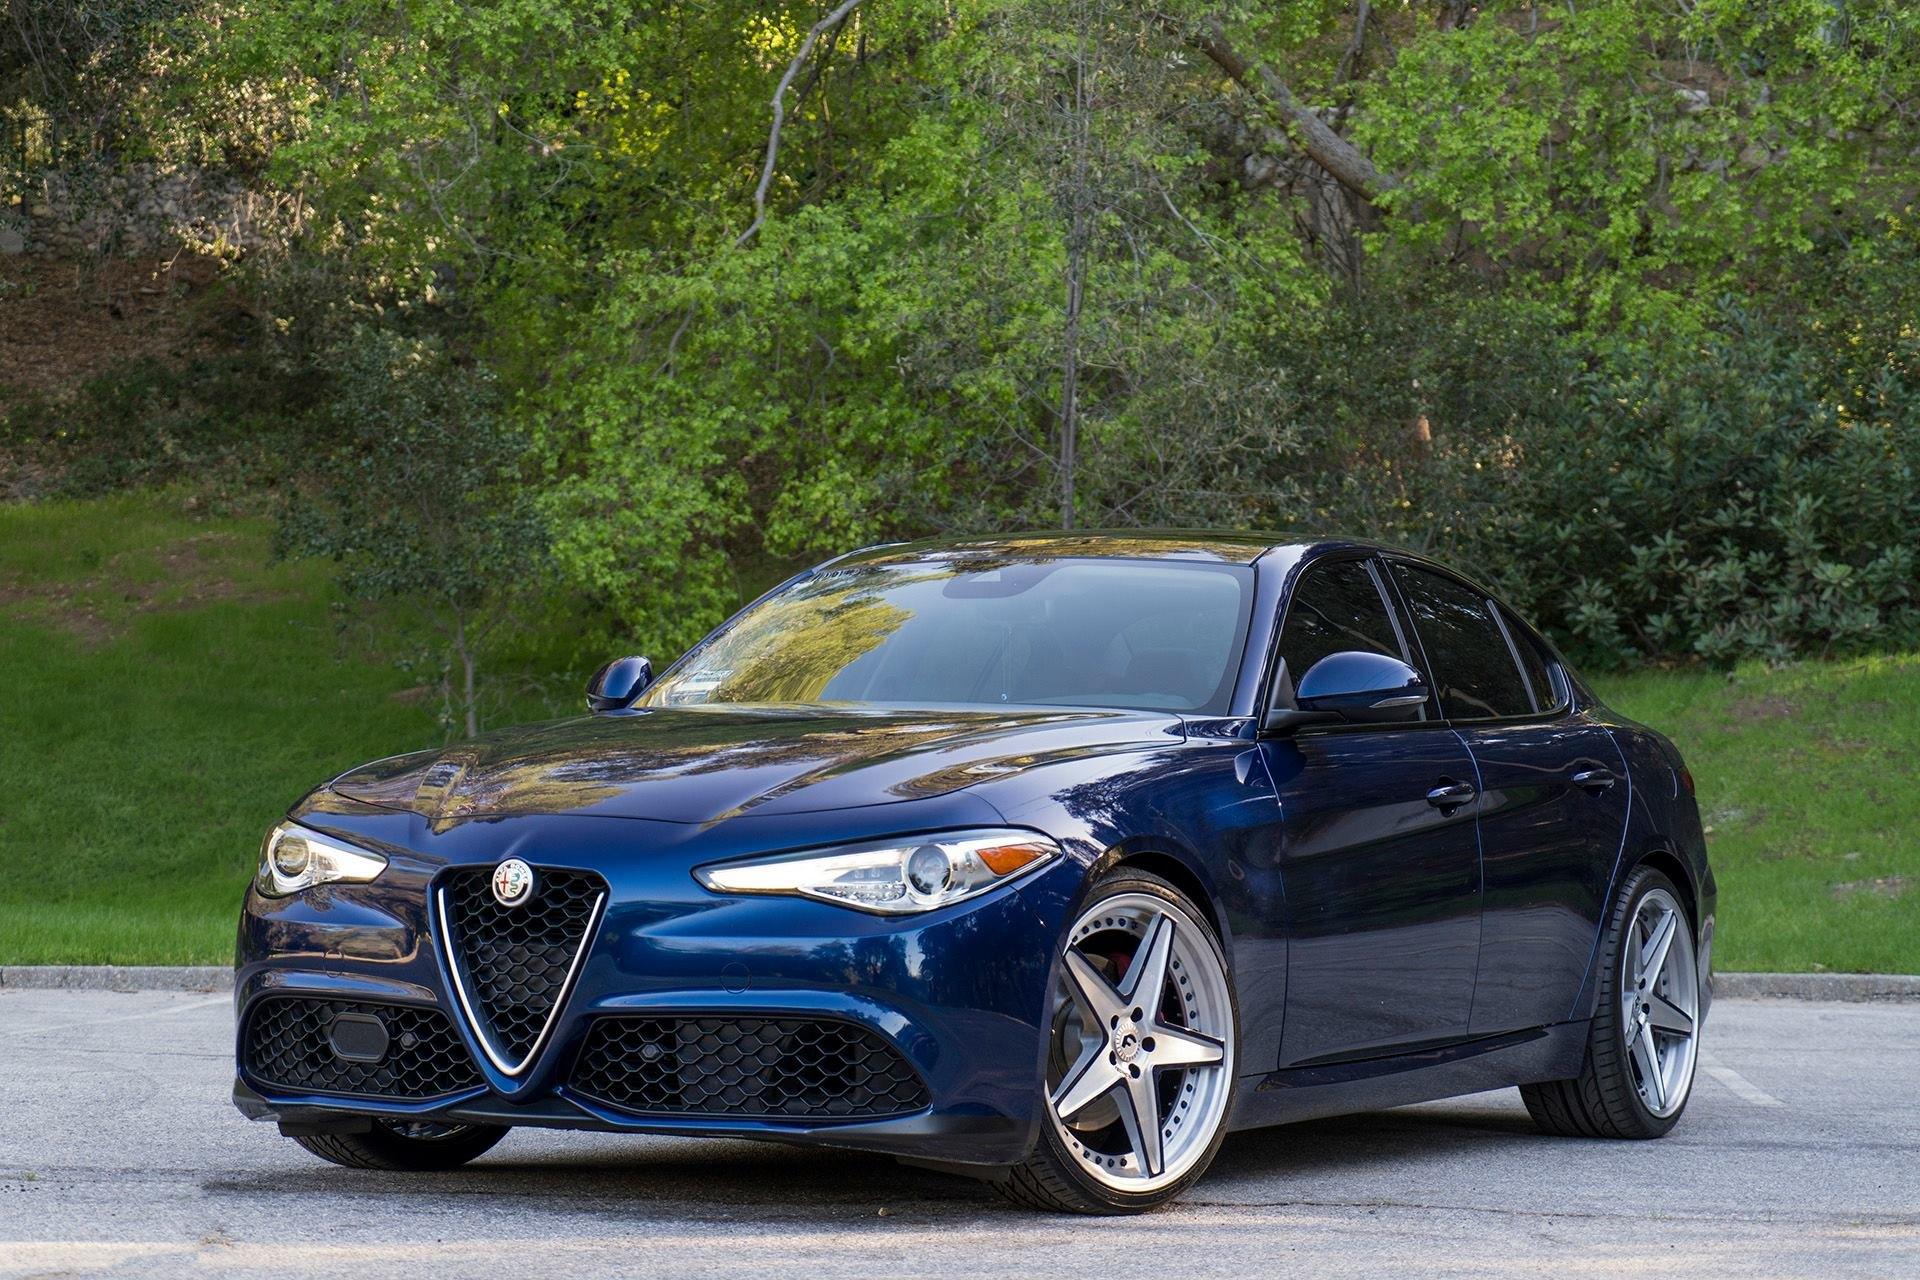 Unique Chrome Forgiato Wheels Enhancing Blue Alfa Romeo Guilia Custom Front Bumper On Photo By